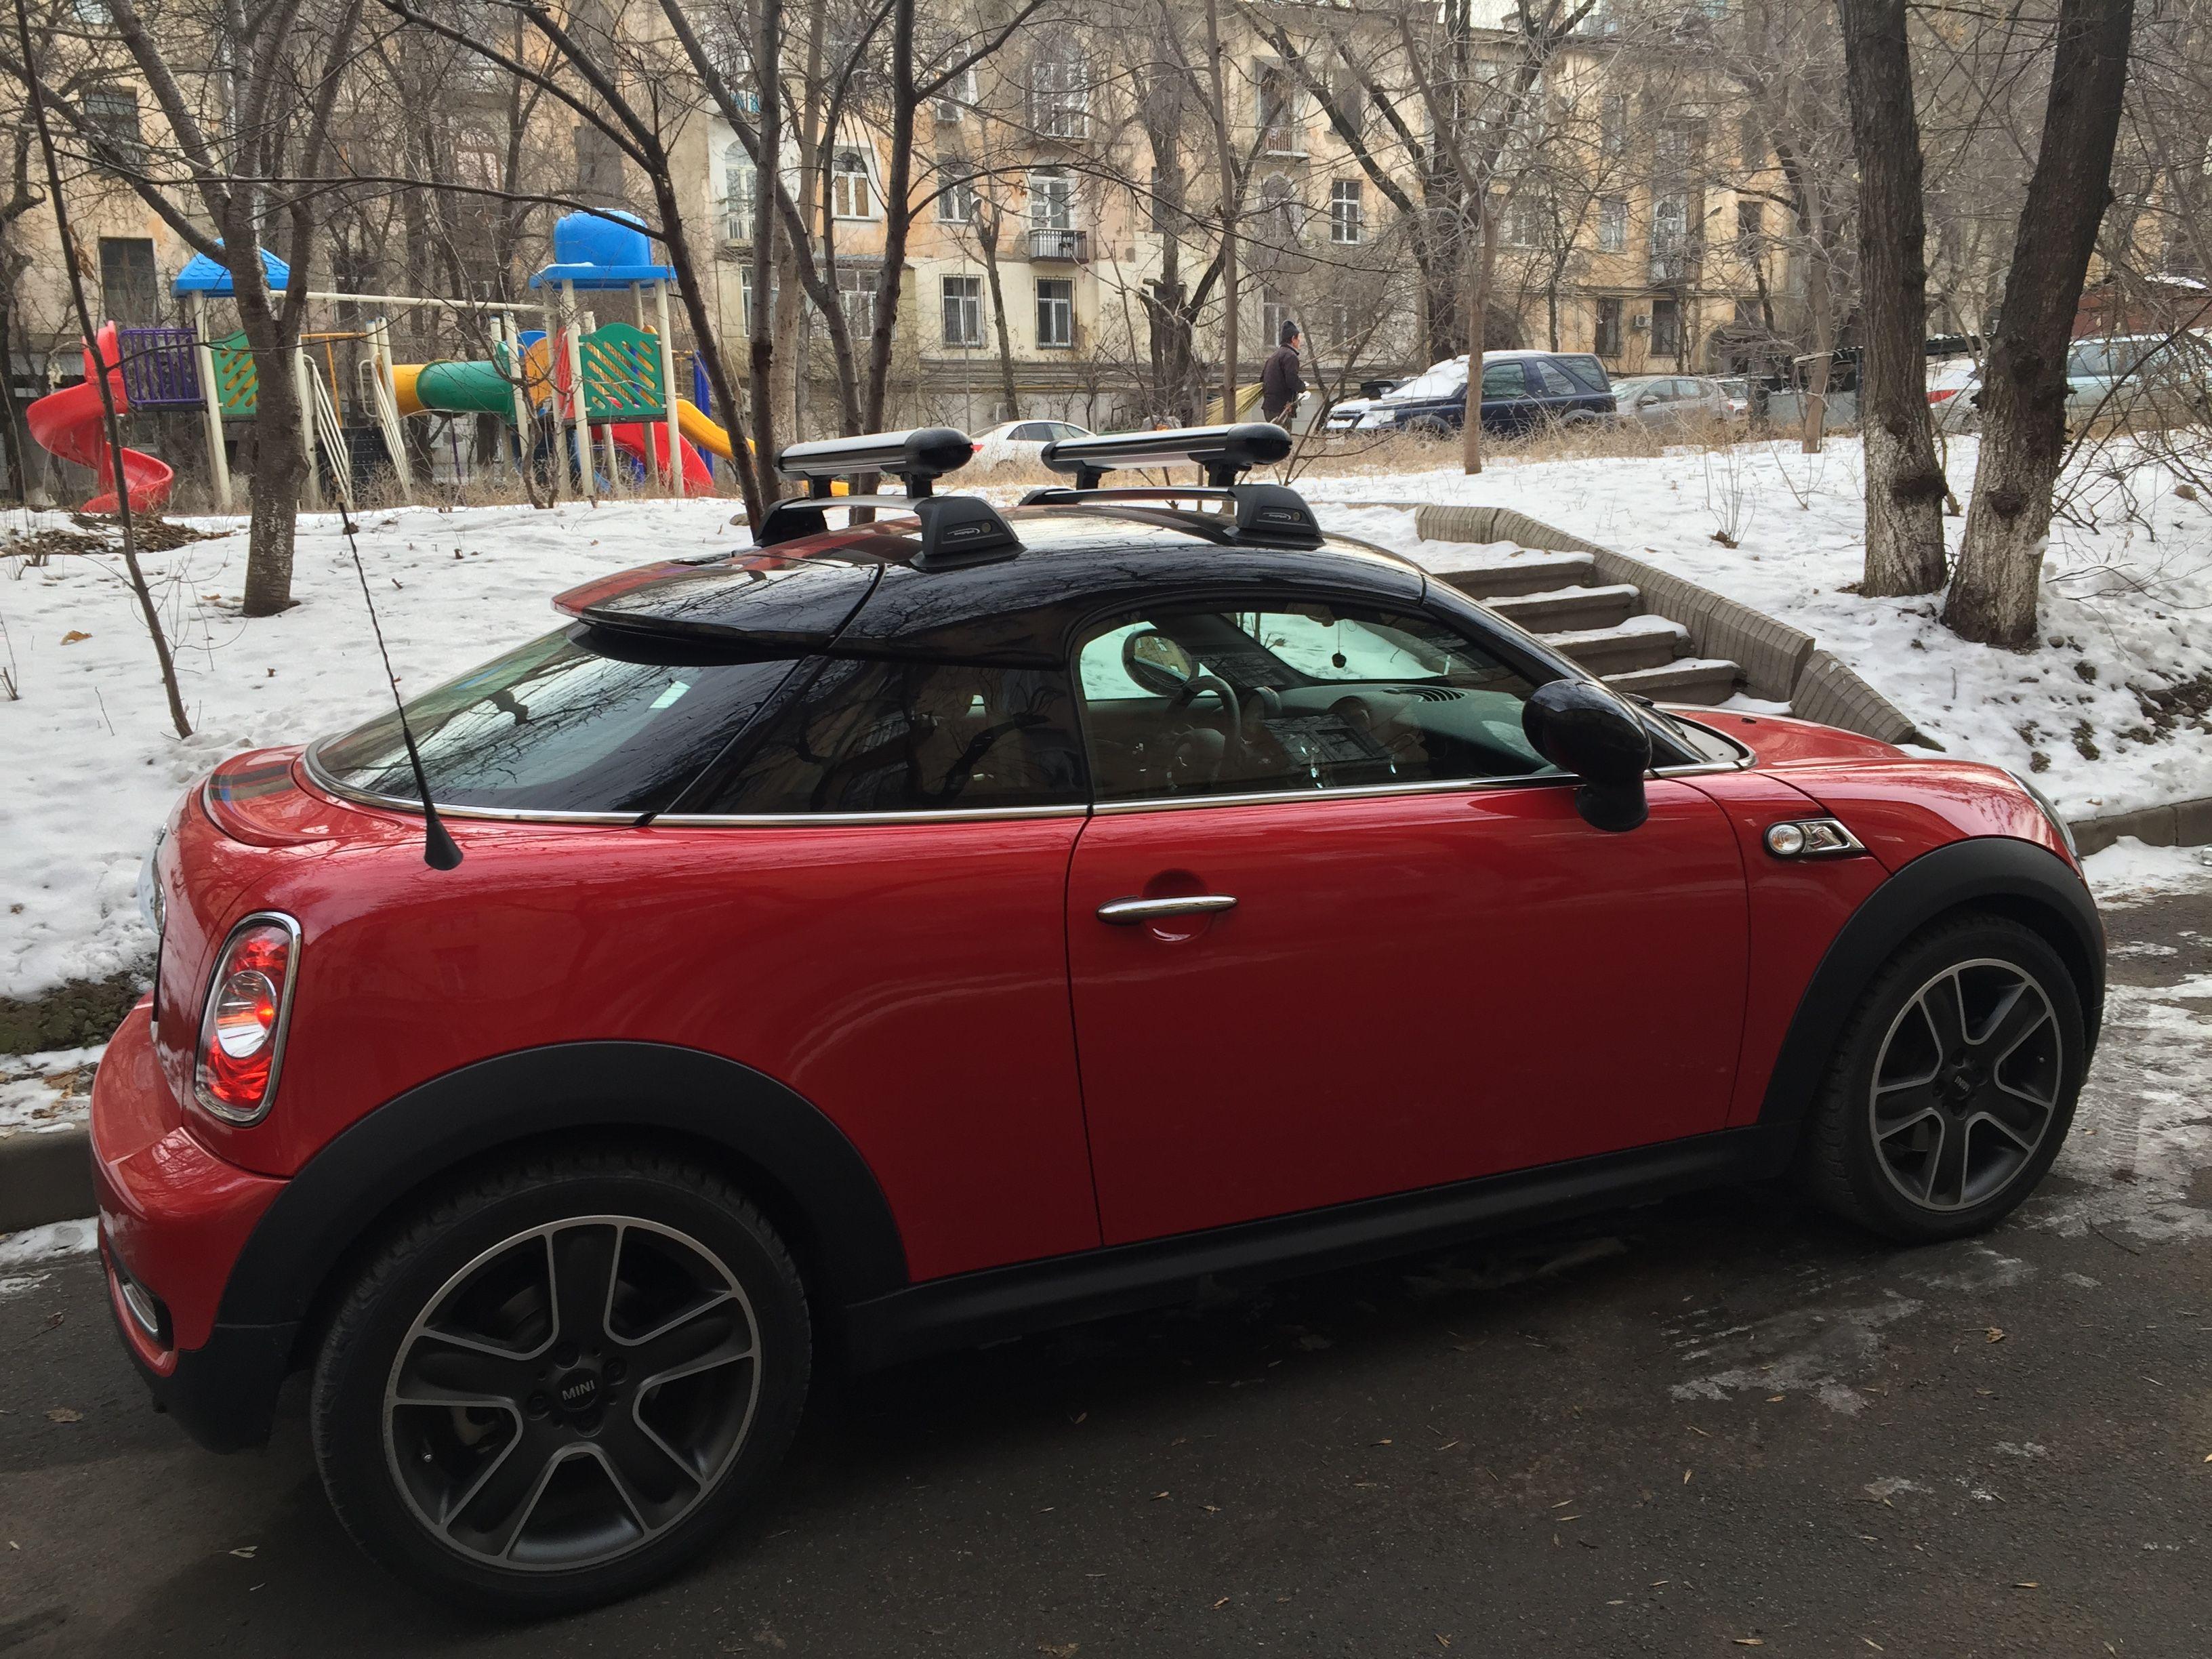 Mini Cooper S Coupe Roof Rack Snowboard #Mini #Coupe #